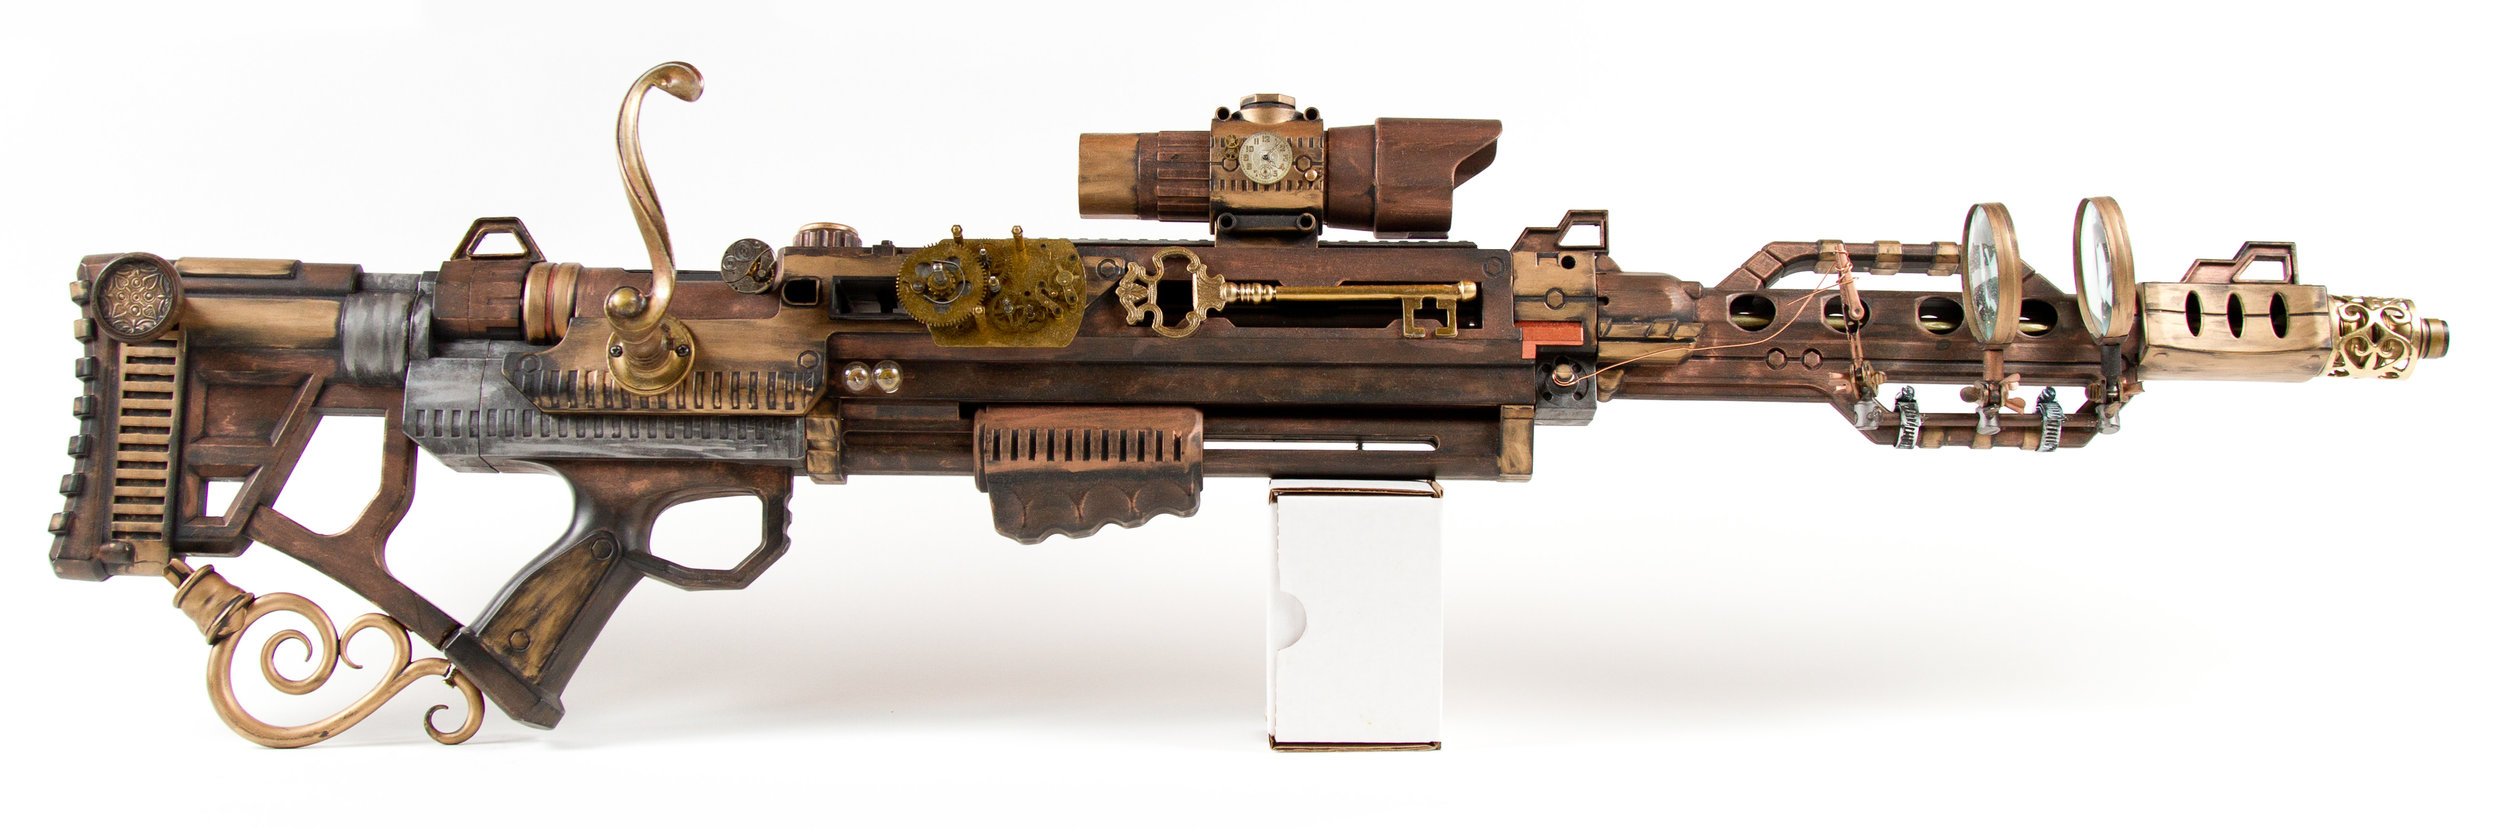 steampunk_rifle_by_3dpoke-d56dchk.jpg